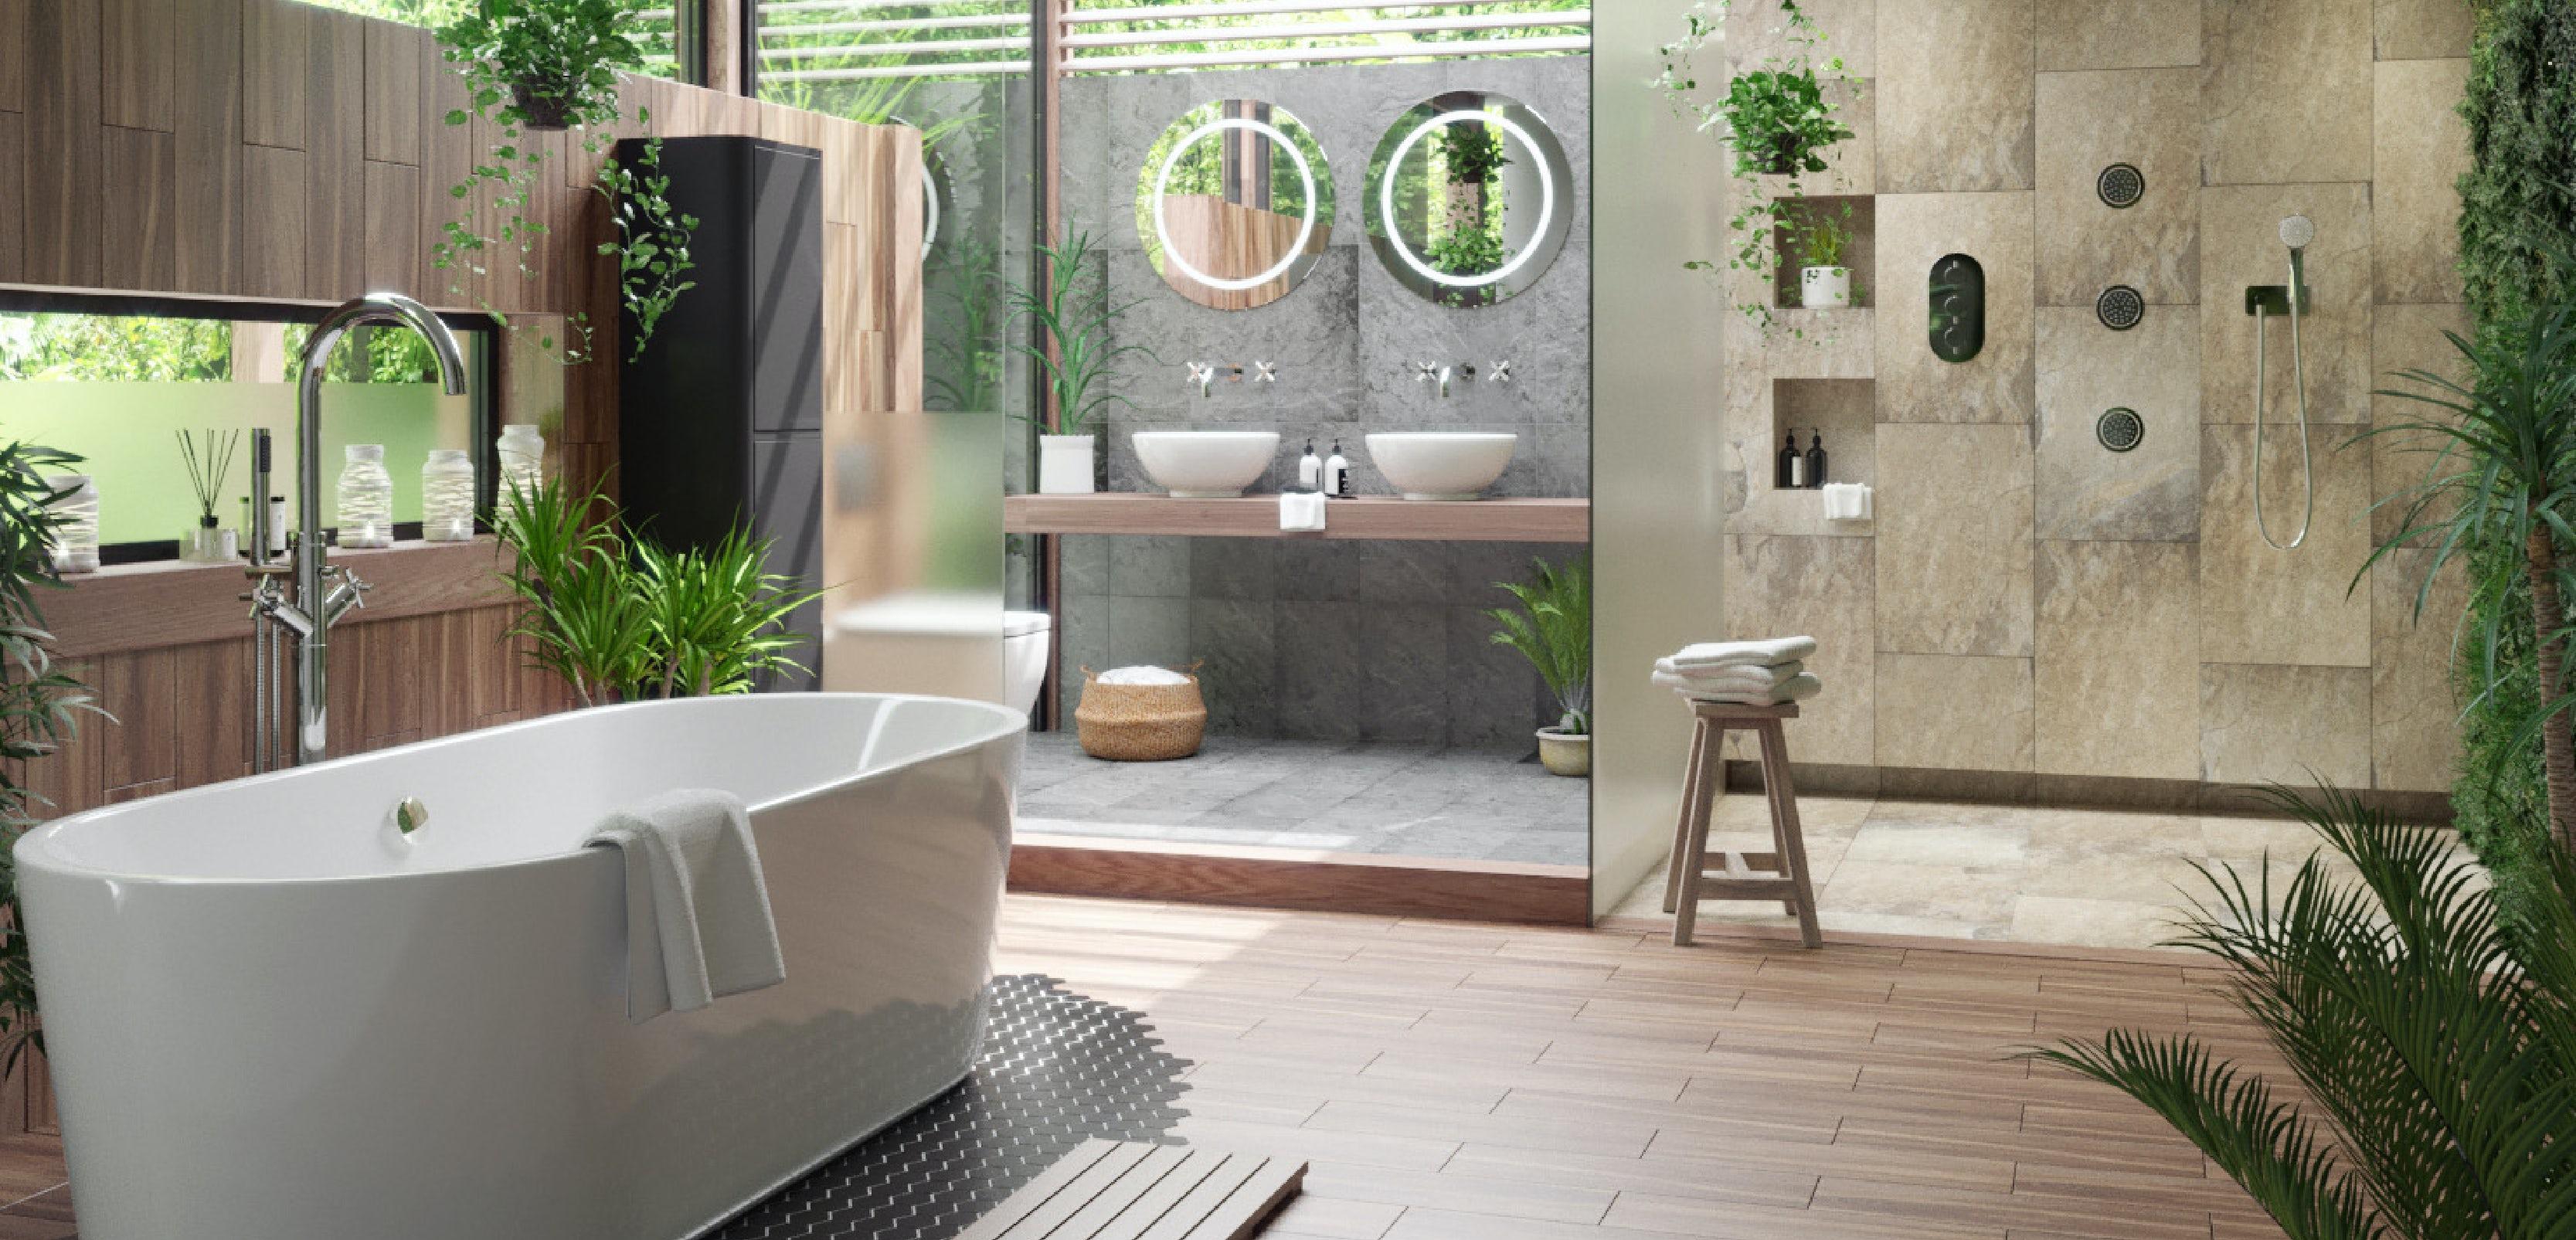 Bathroom Ideas: Tropical Bathrooms